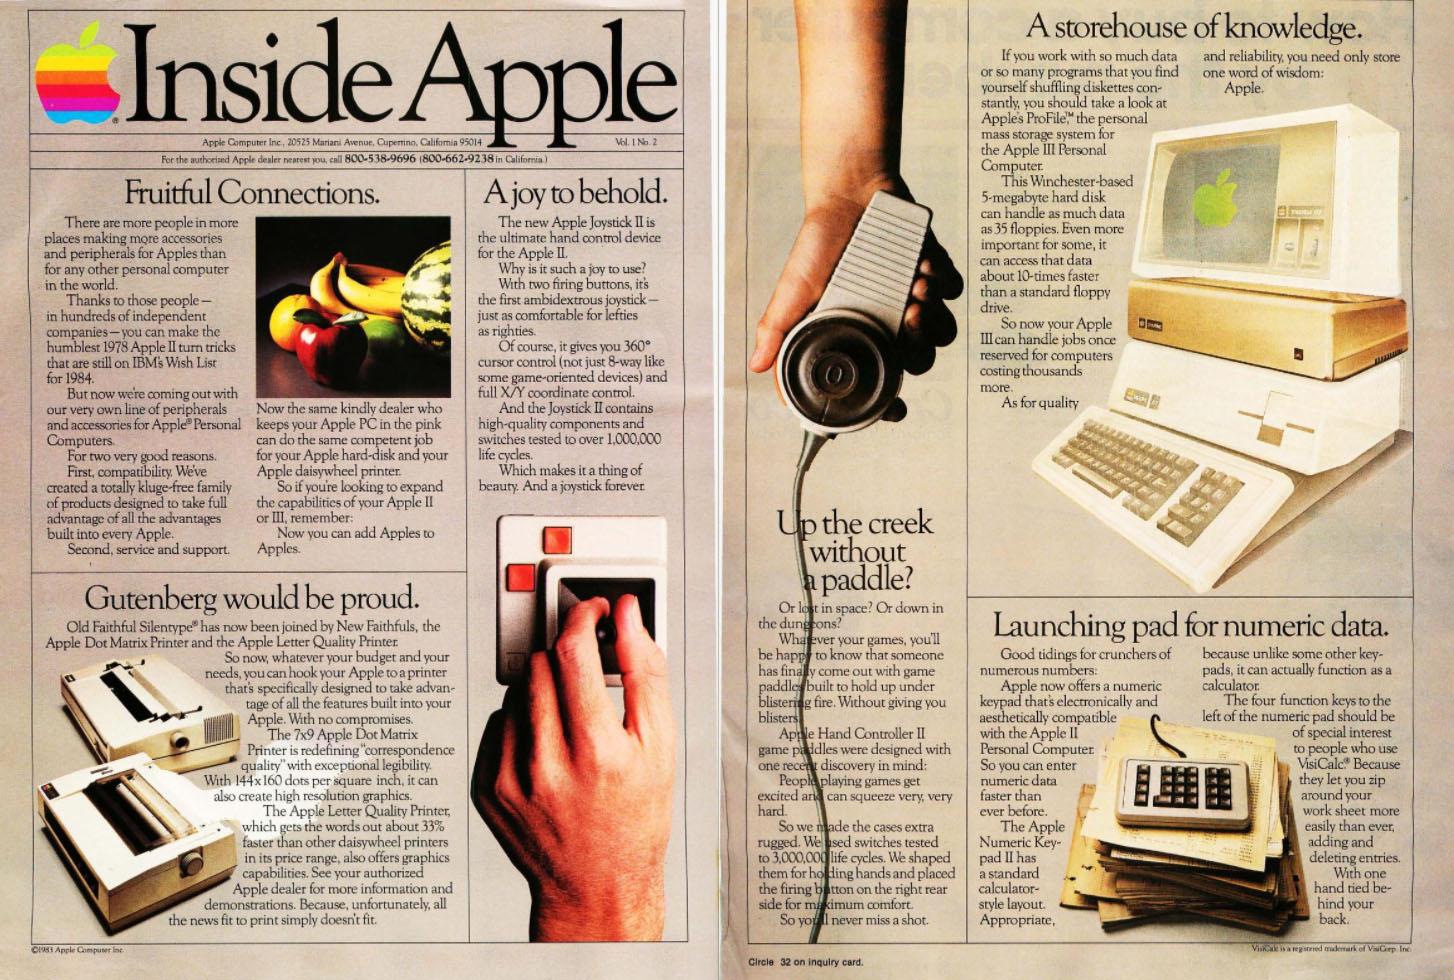 Inside Apple, 1983